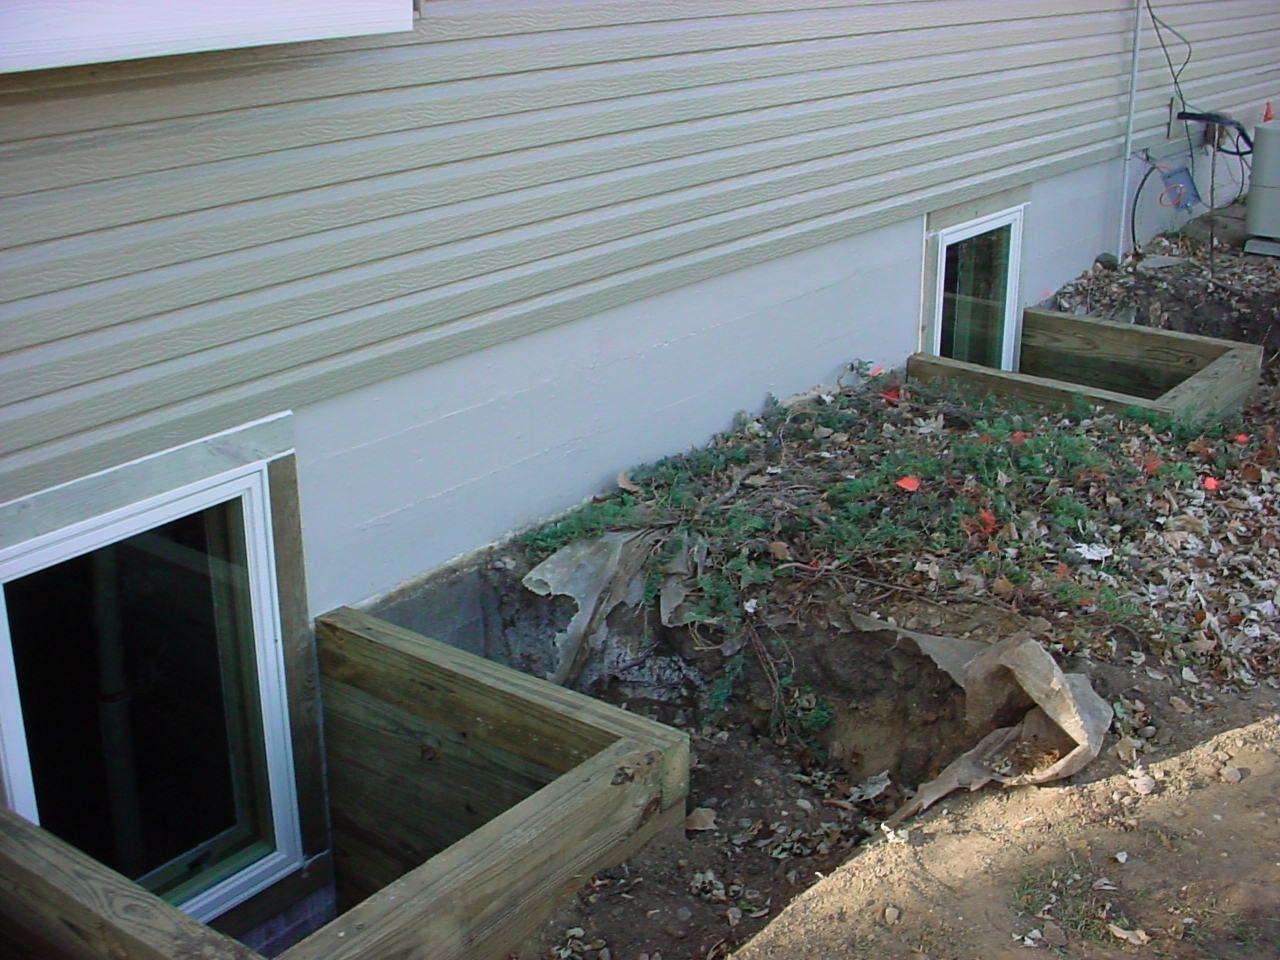 Basement windows more window ideas egress window basements windows - Basement Windows Egress Windowbasement